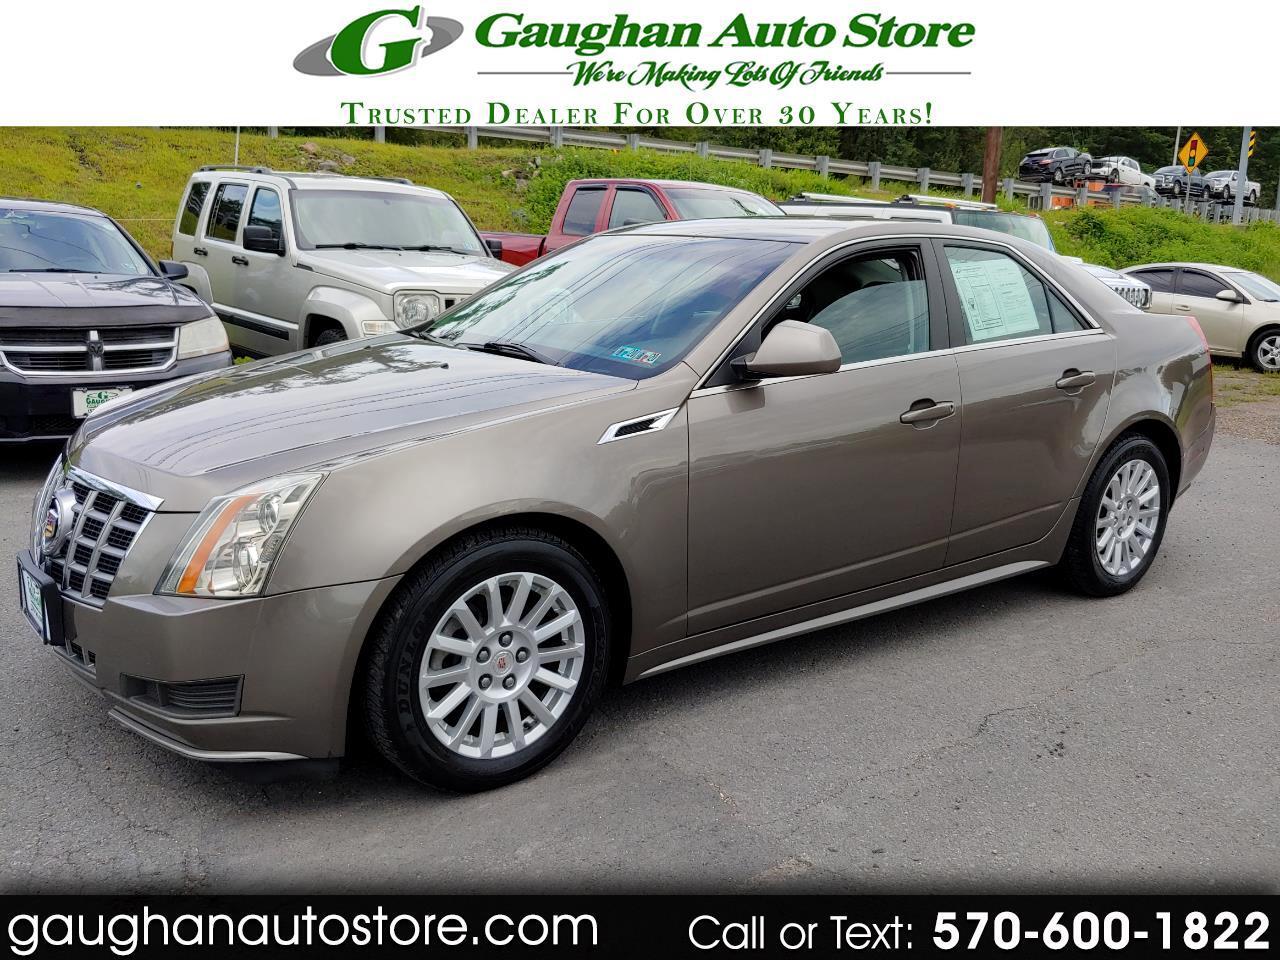 2012 Cadillac CTS Sedan AWD